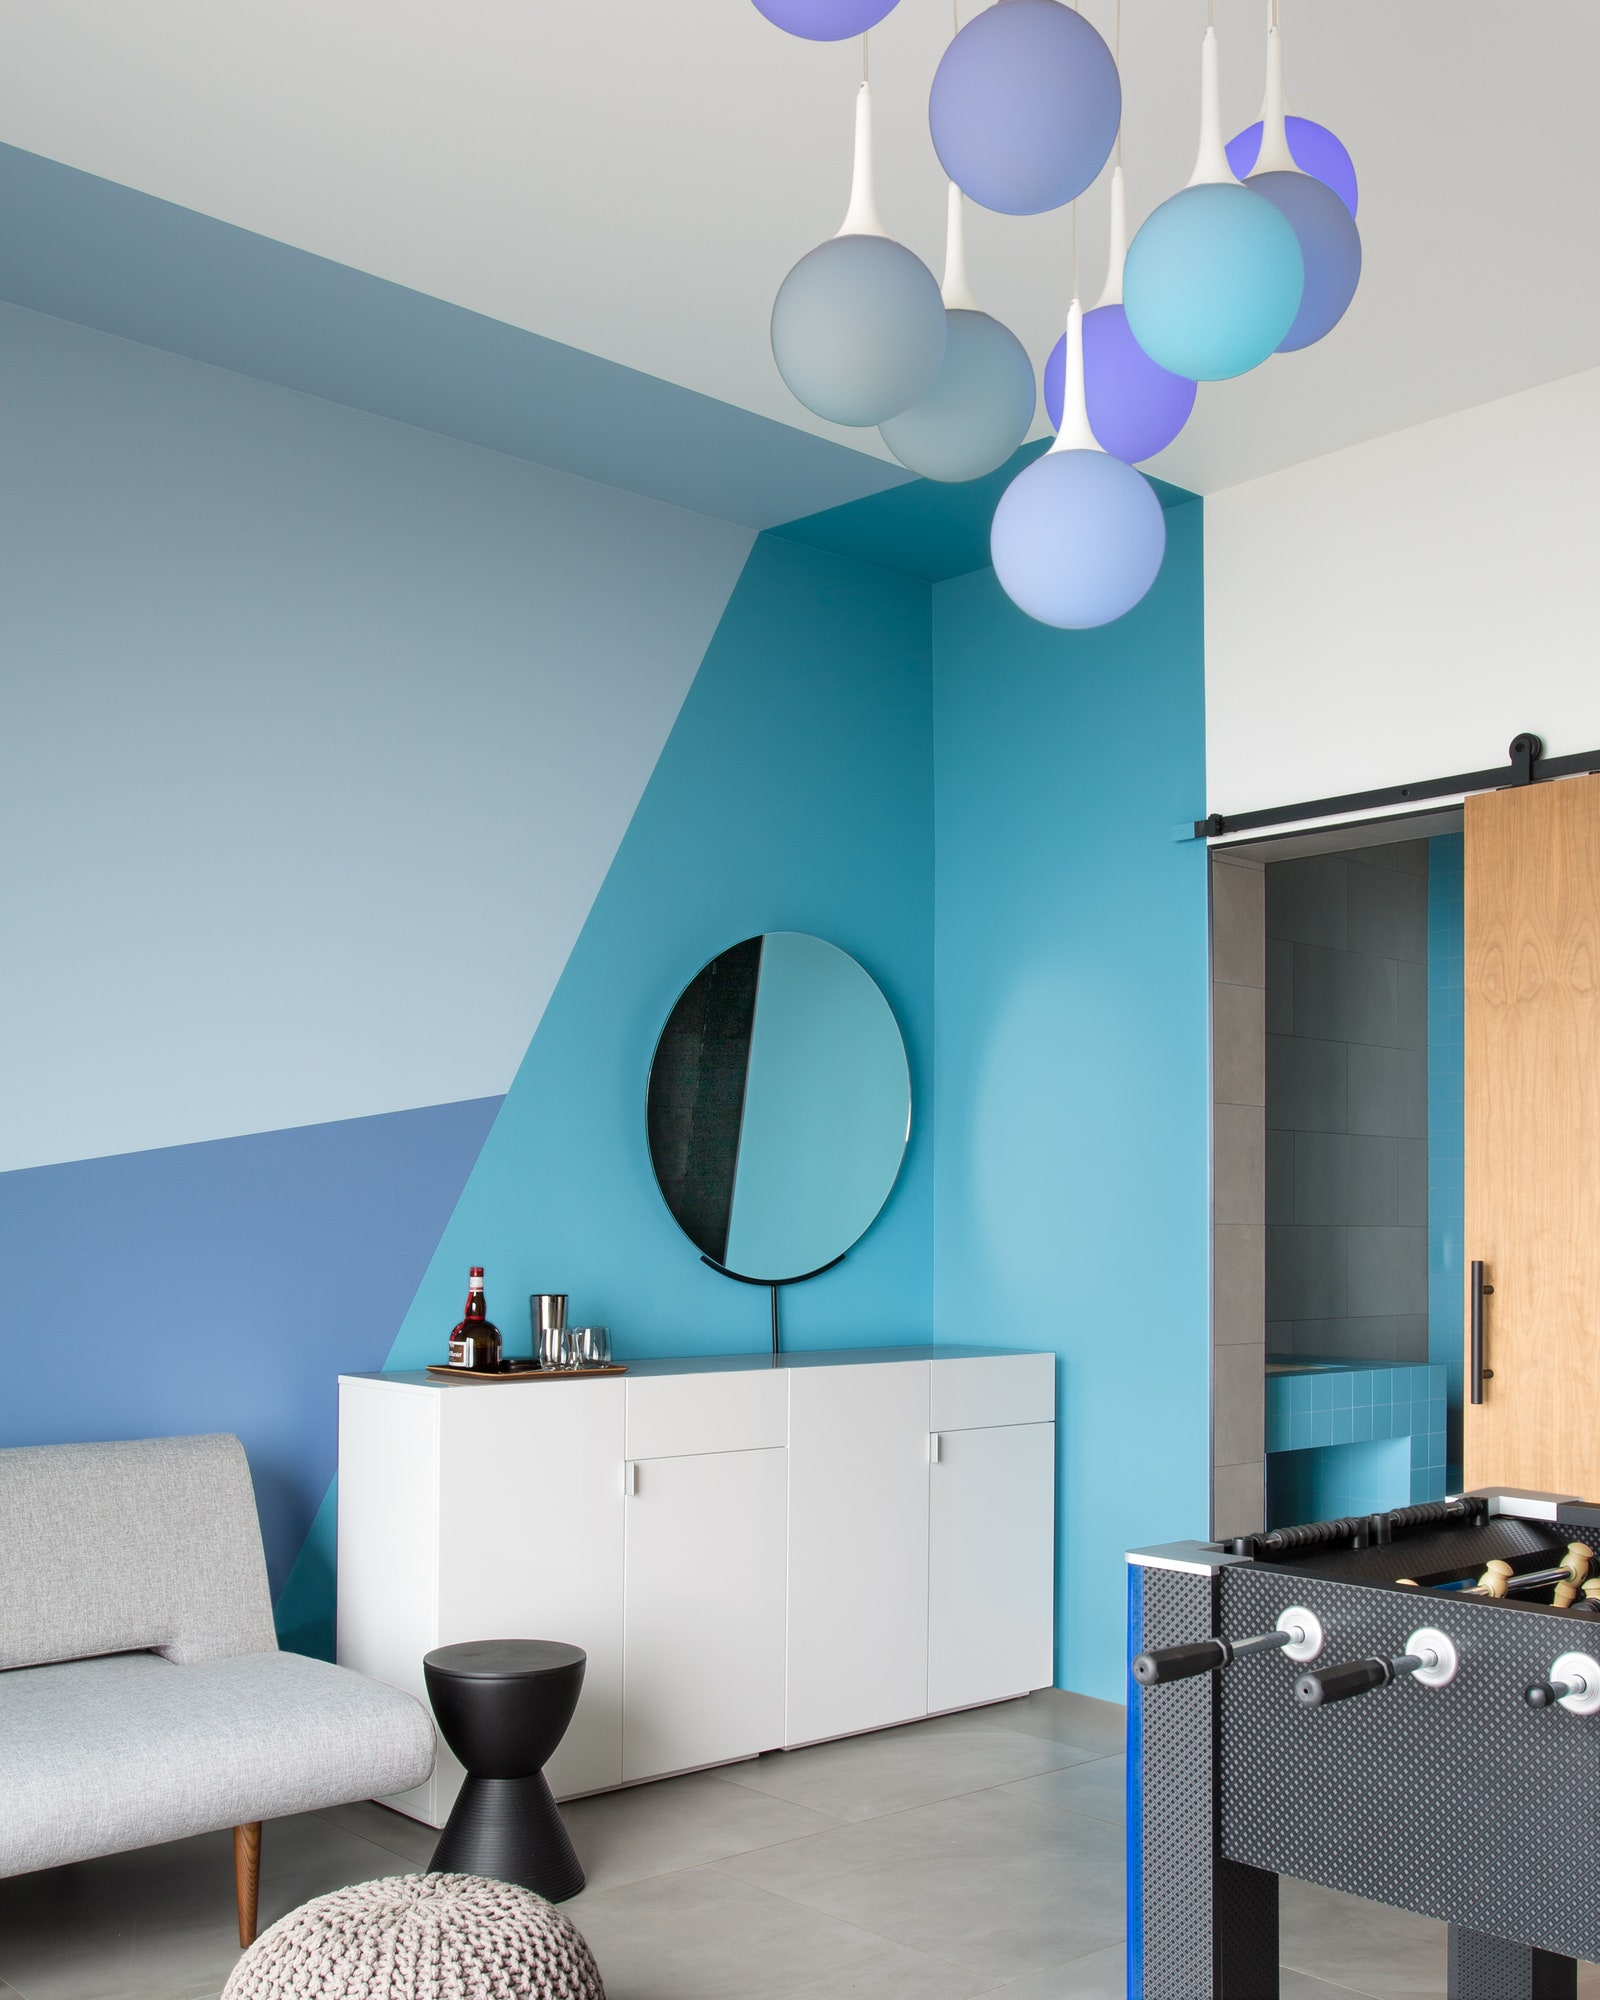 .     Innovation Living.  Blue Dot        Hue Philips        Atomic Azure  Dura Poxy KellyMoore      .   Ergon Architect.